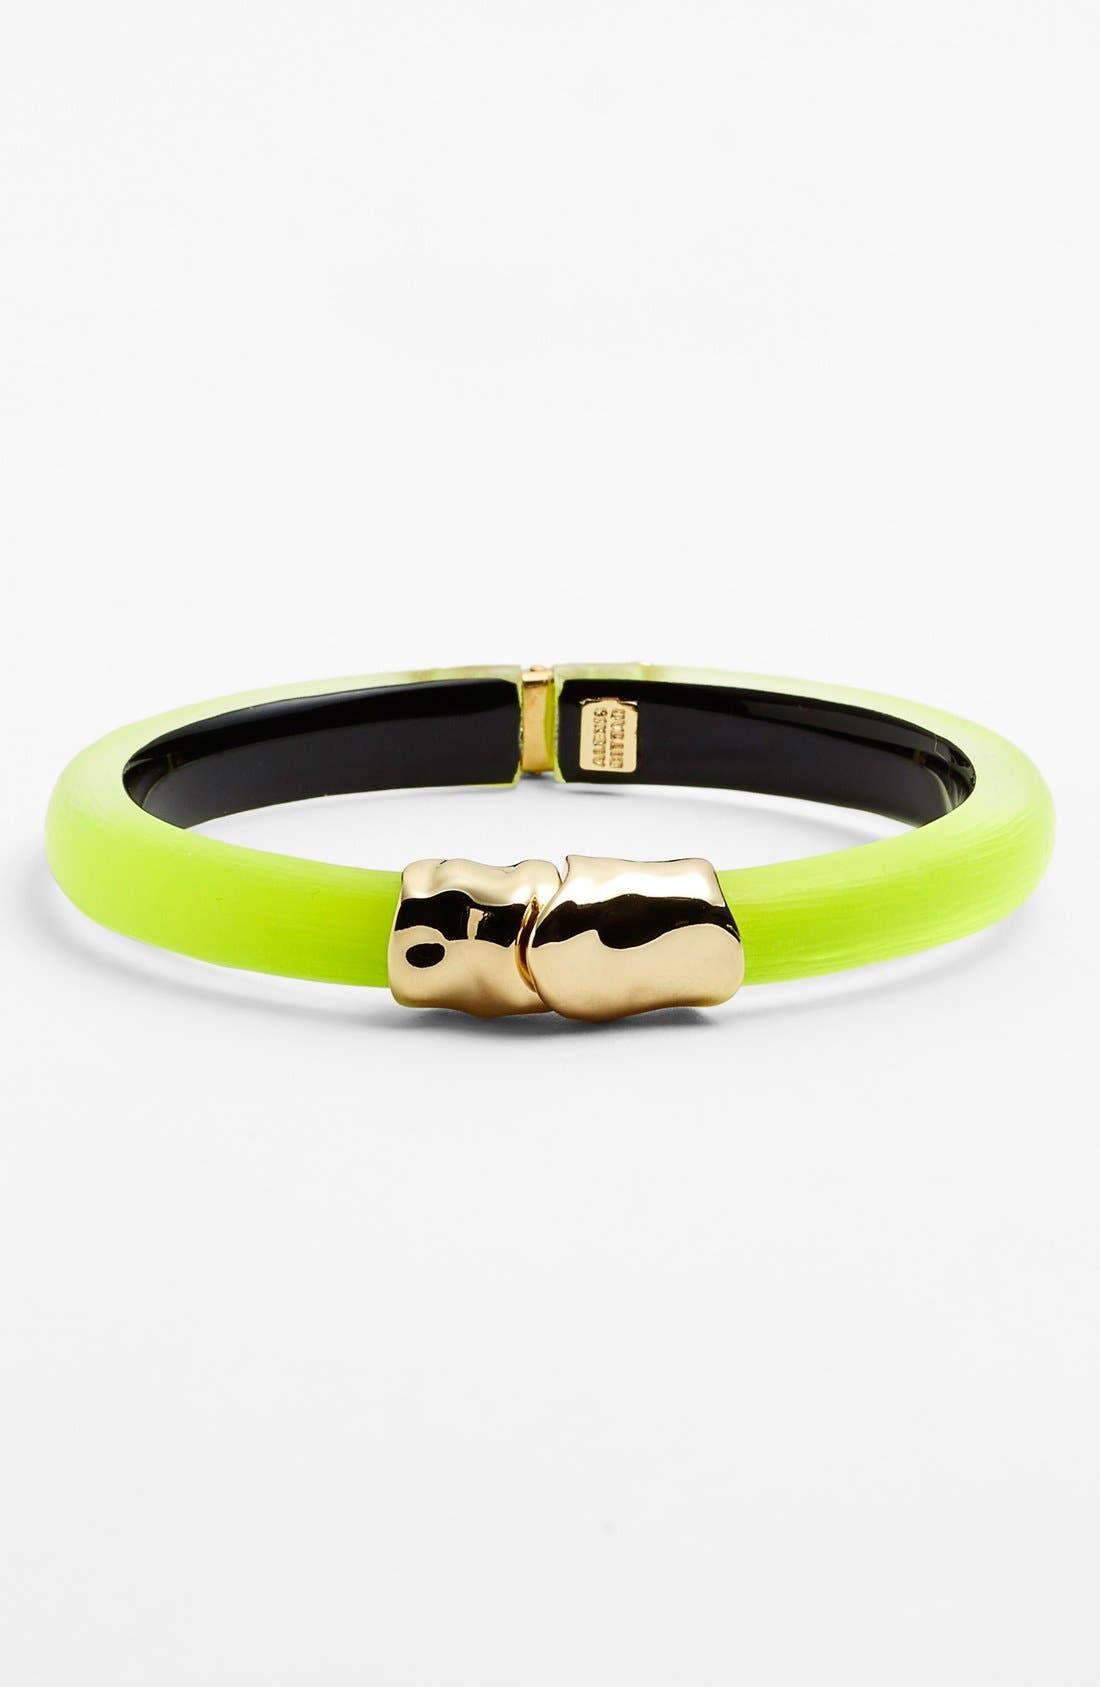 Main Image - Alexis Bittar 'Lucite®' Hinged Bracelet